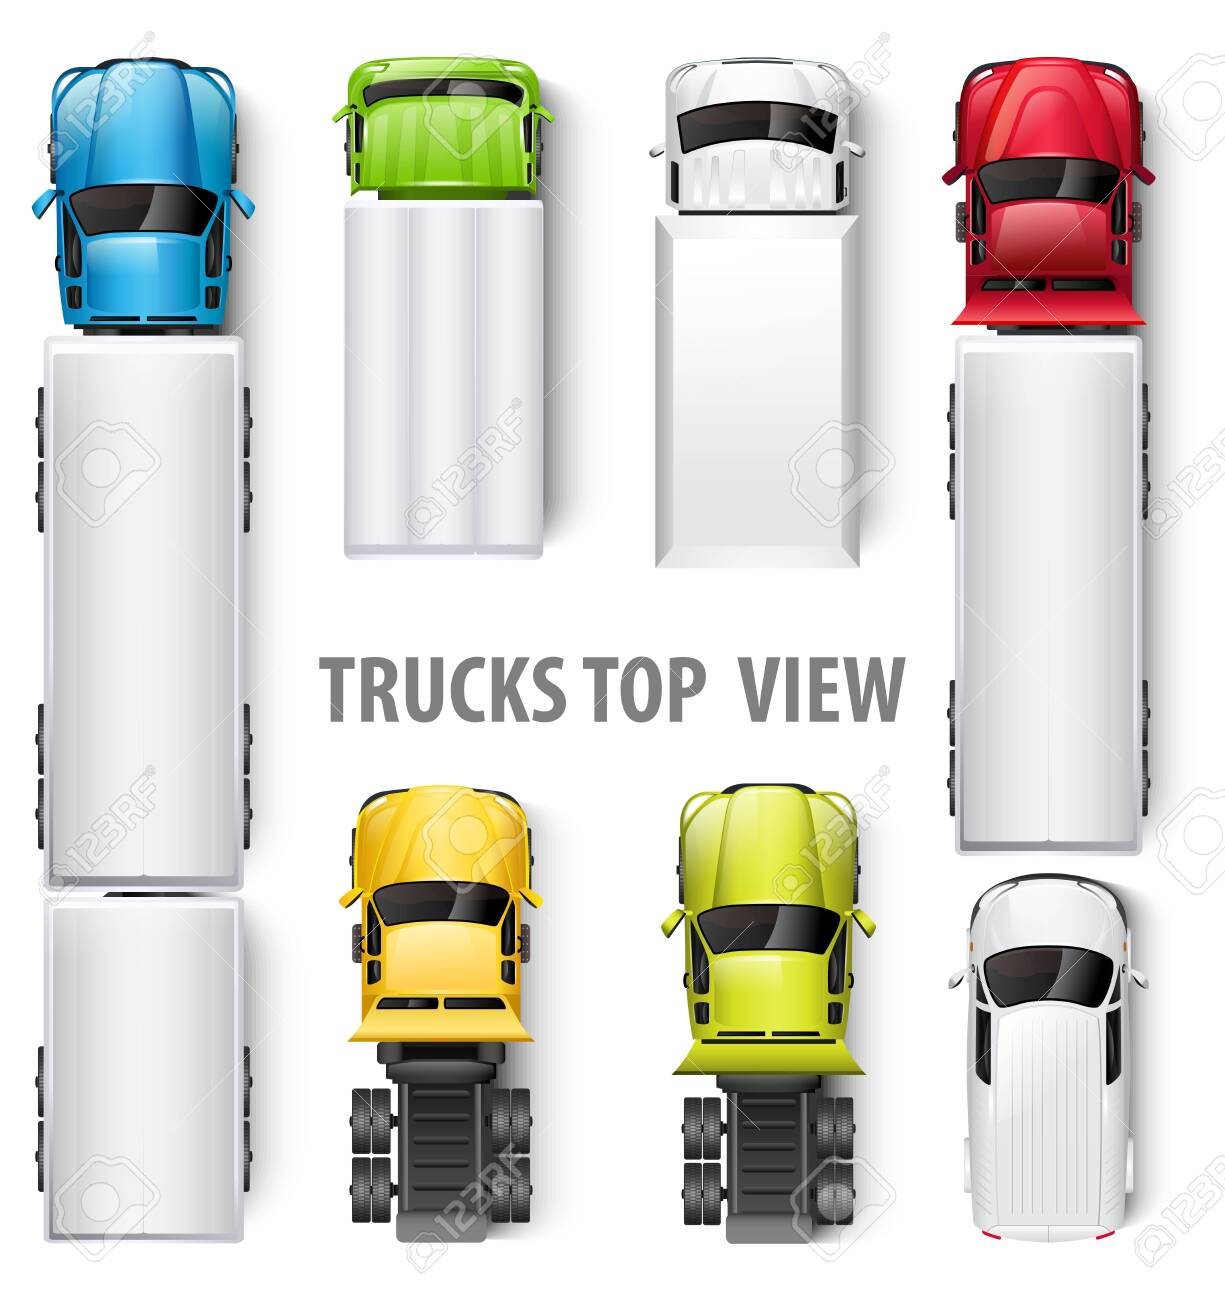 Trucks top view. Vector illustration - 141556416